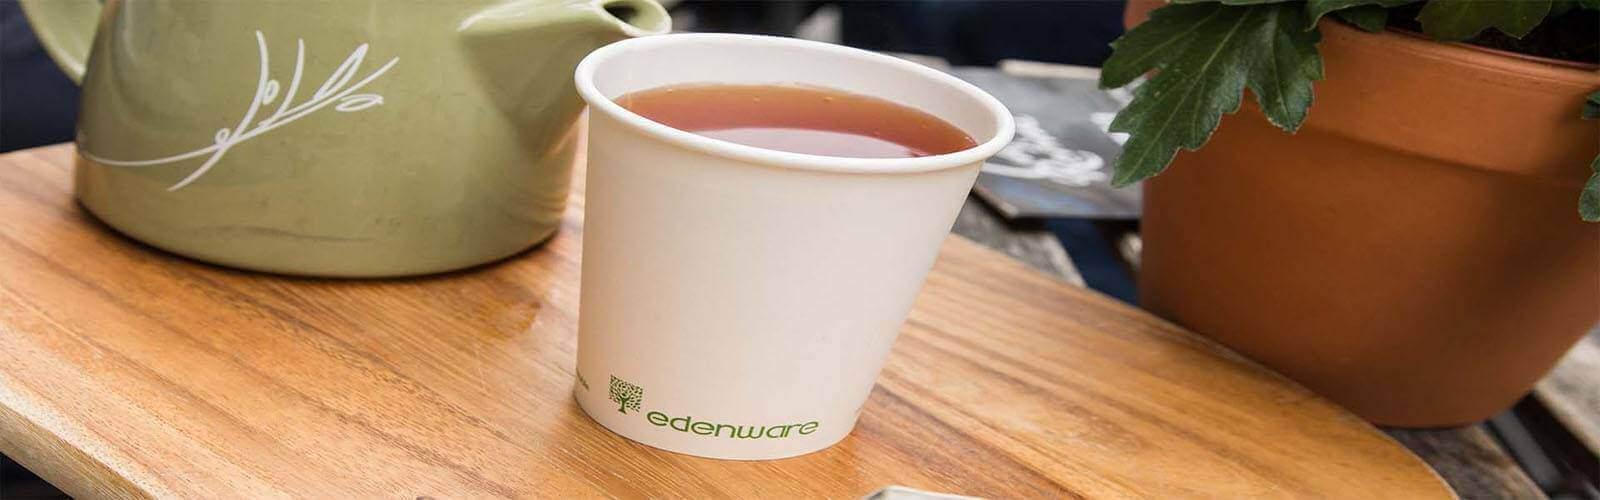 Bio-Degradeable Cups